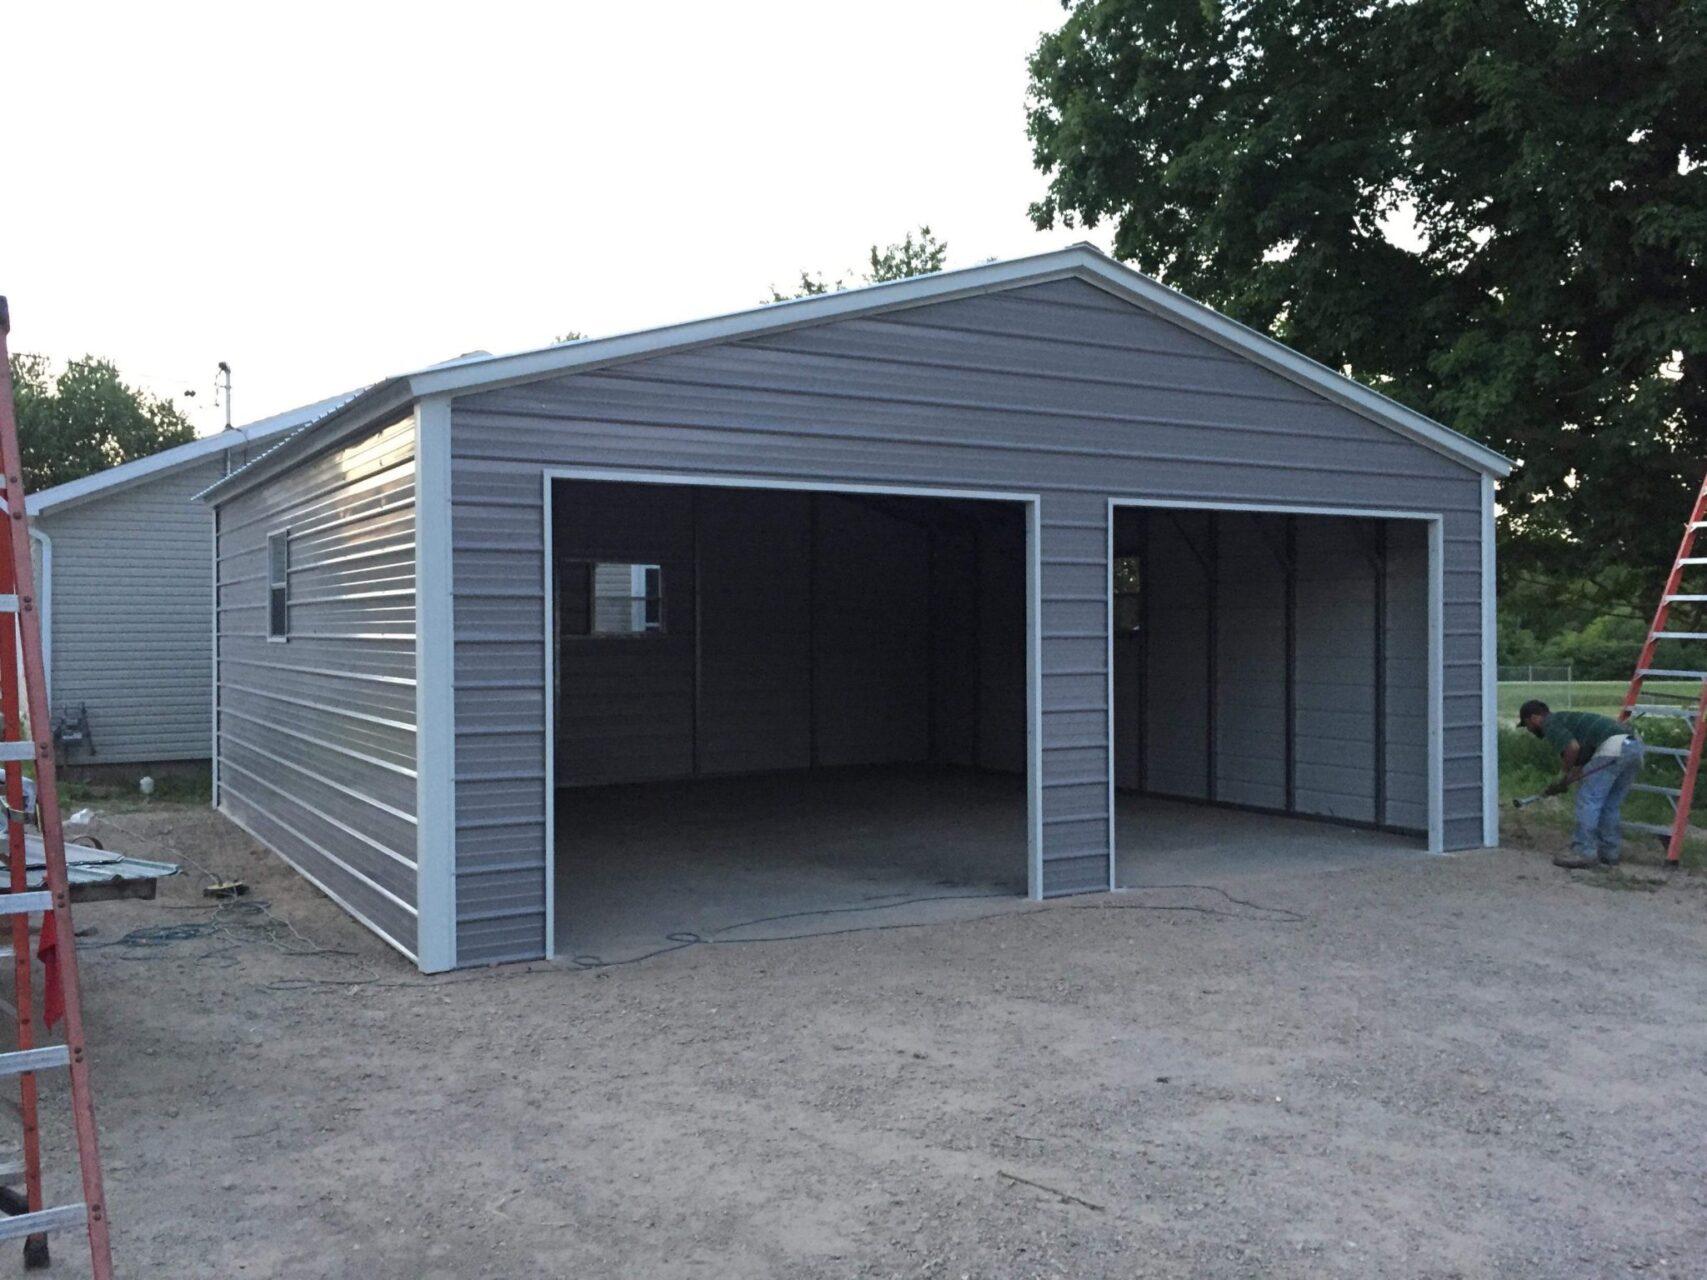 26x25x9 Steel Two Stall Garage in Vassar, Michigan